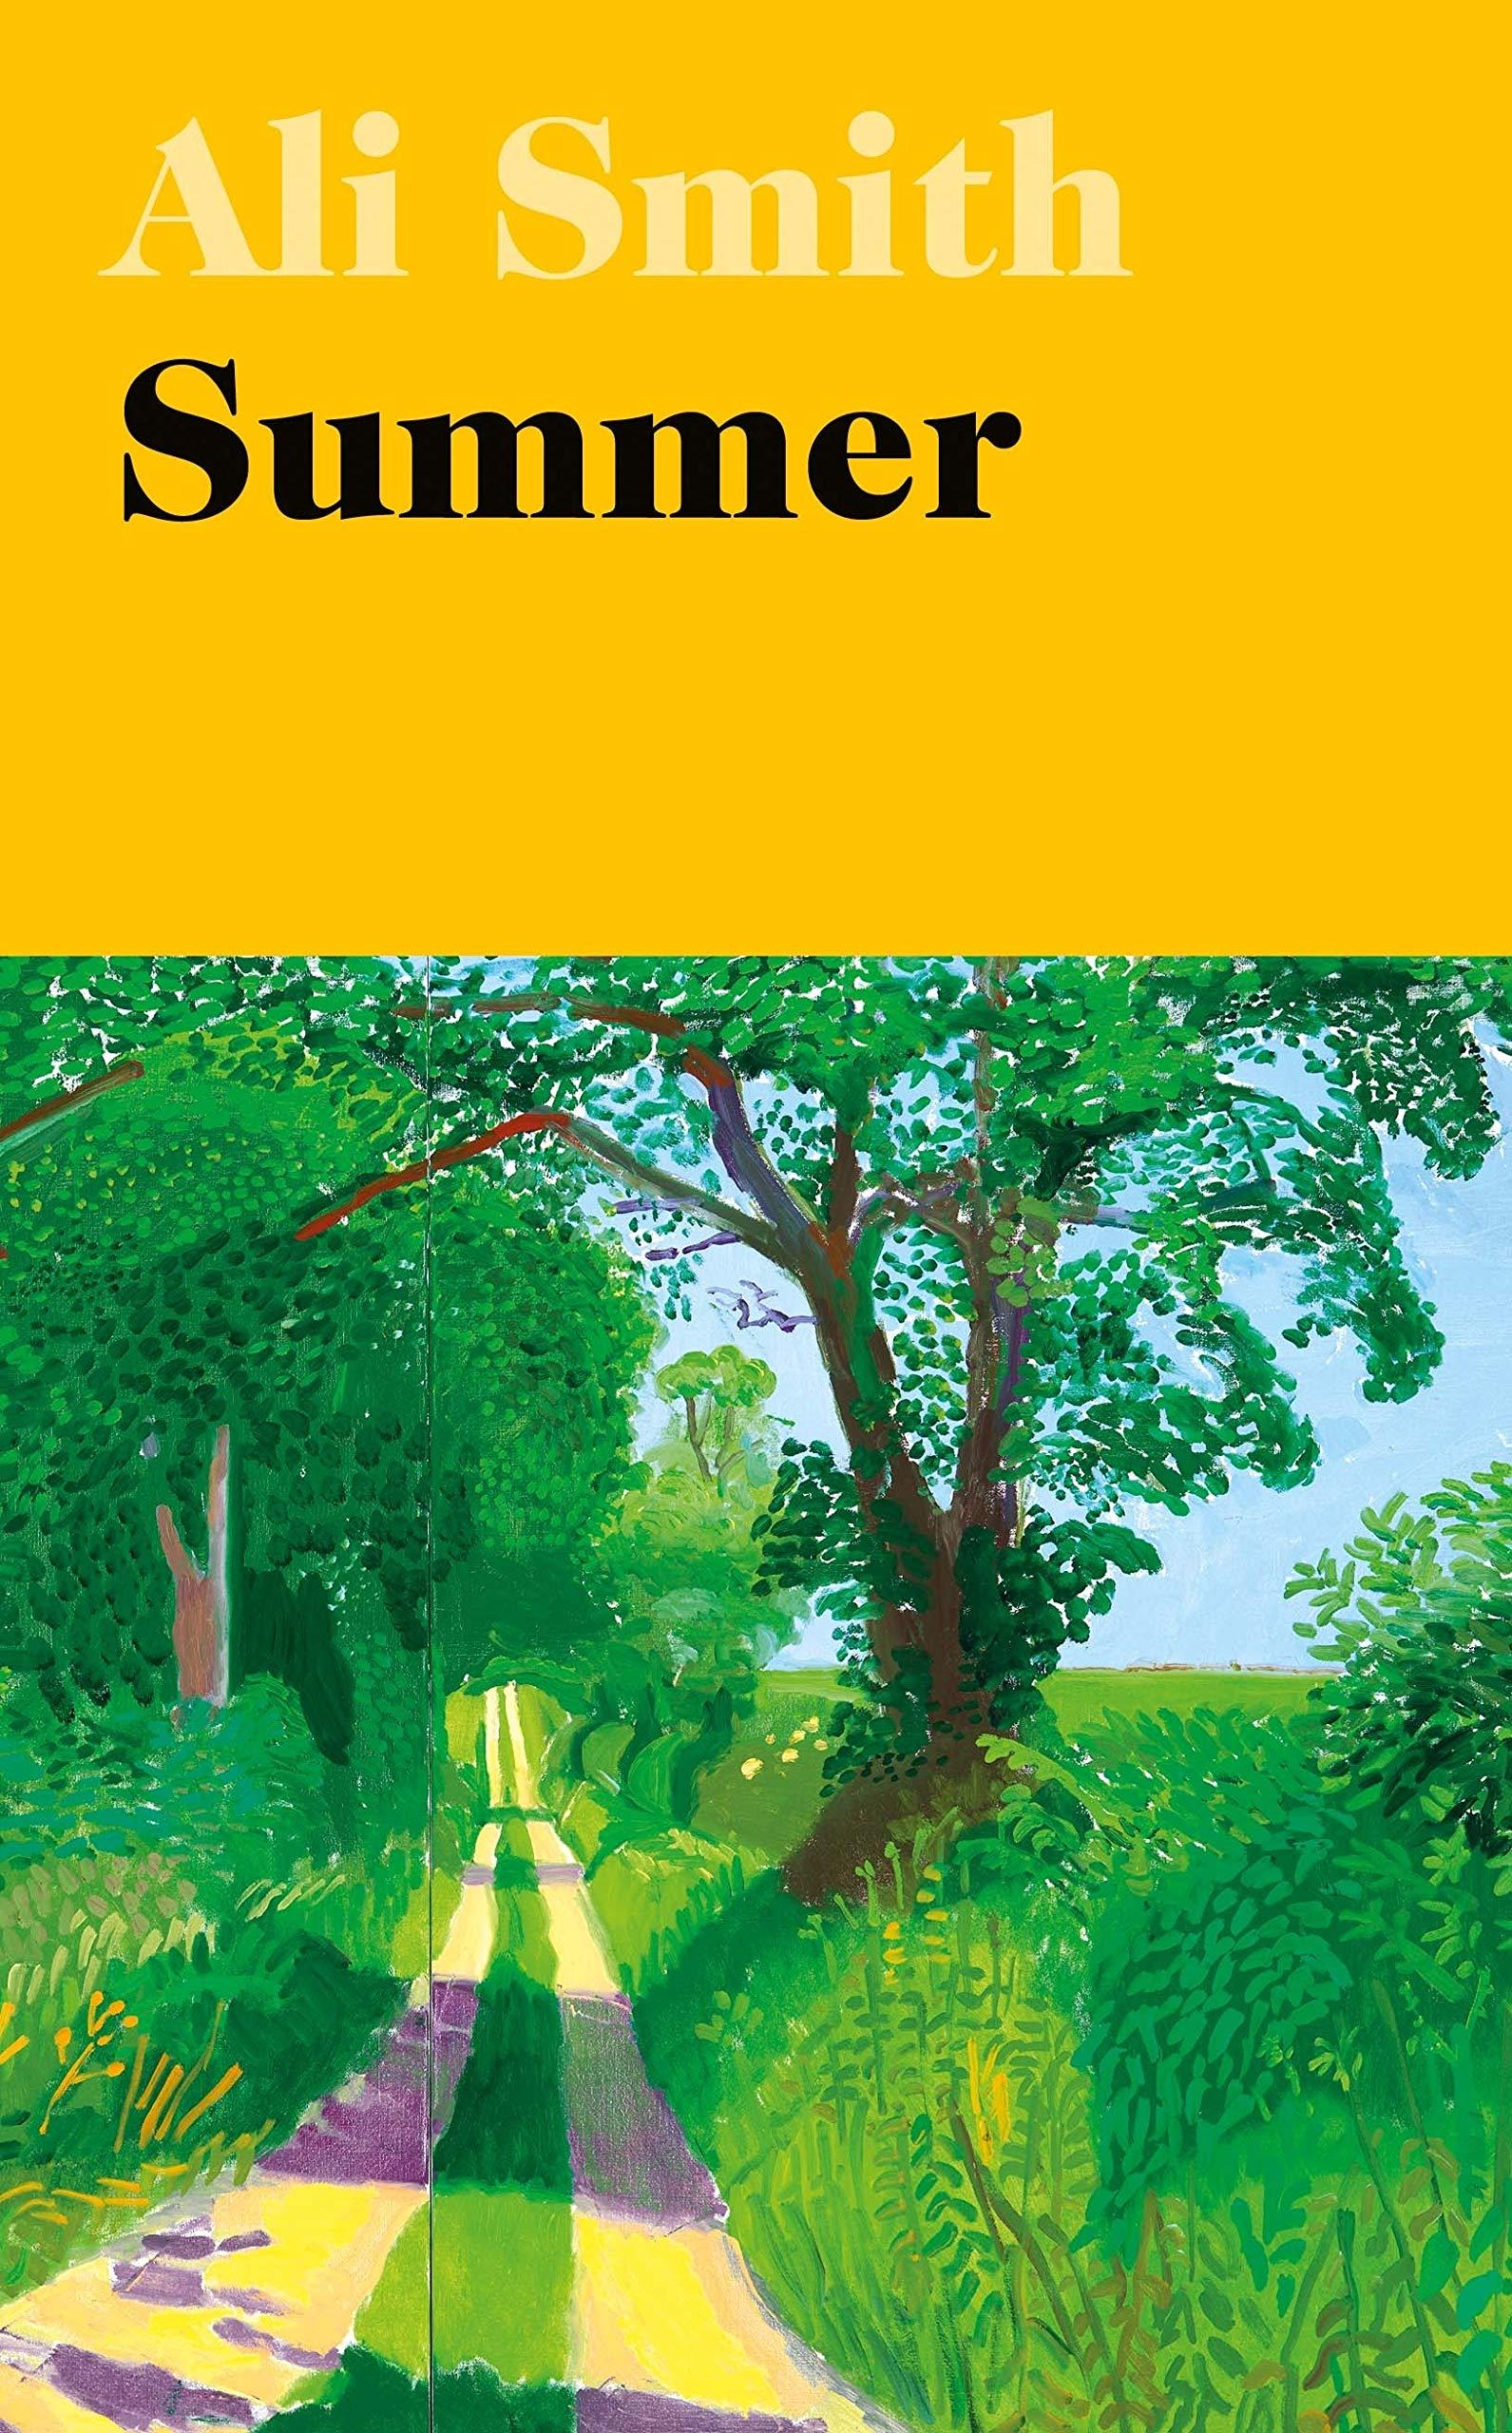 Ali Smith, 'Summer'